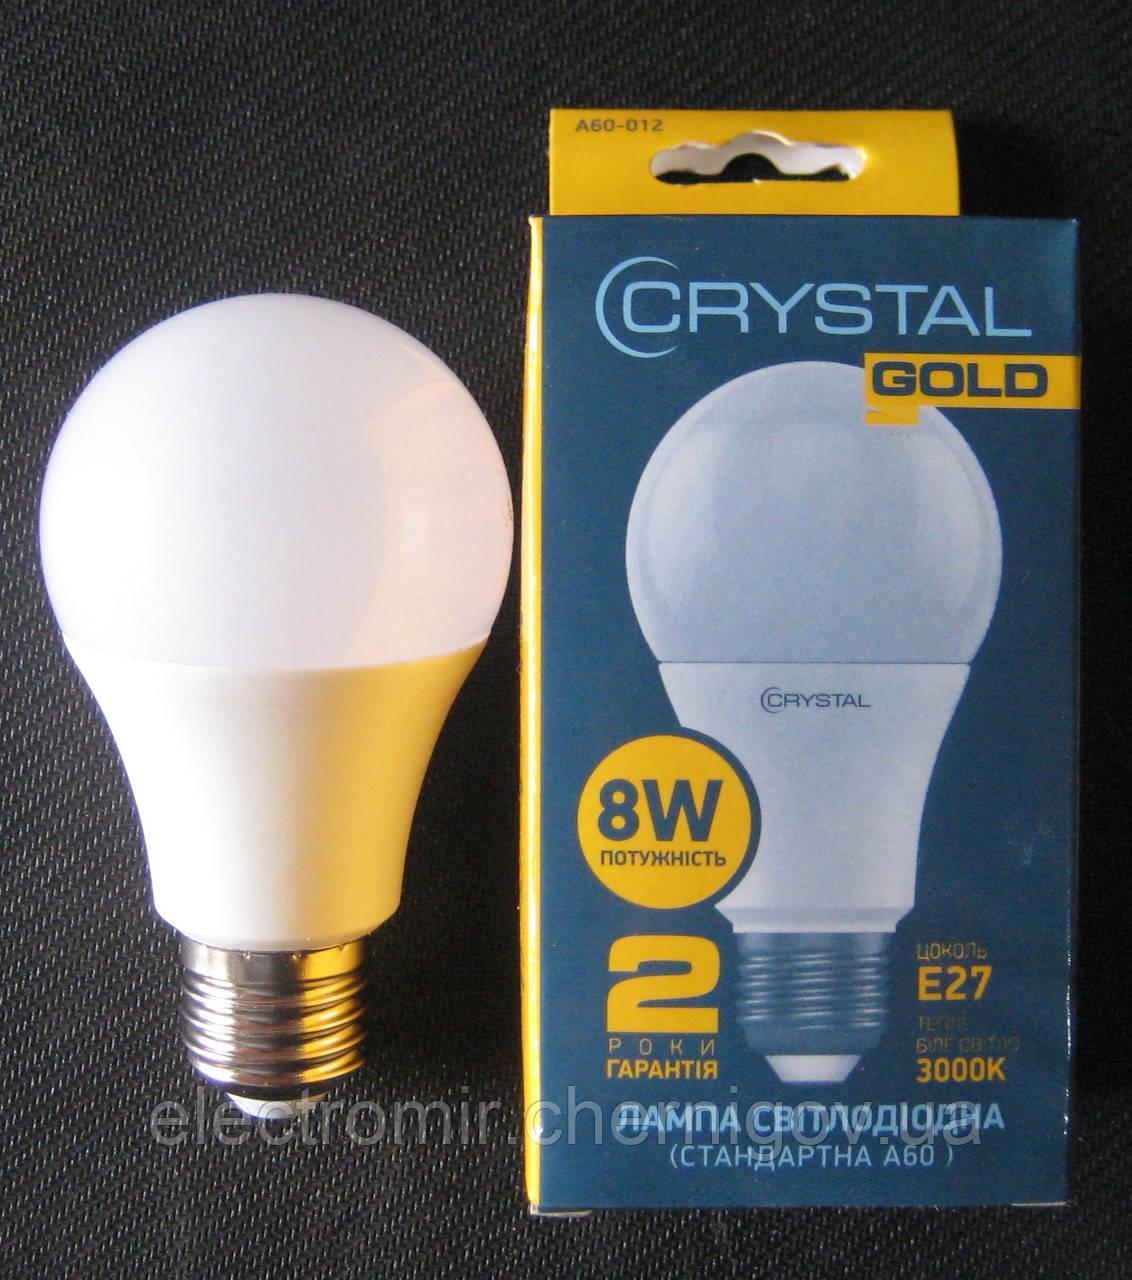 Лампа светодиодная Crystal 8W E27 3000K A60 (сфера стандарт)